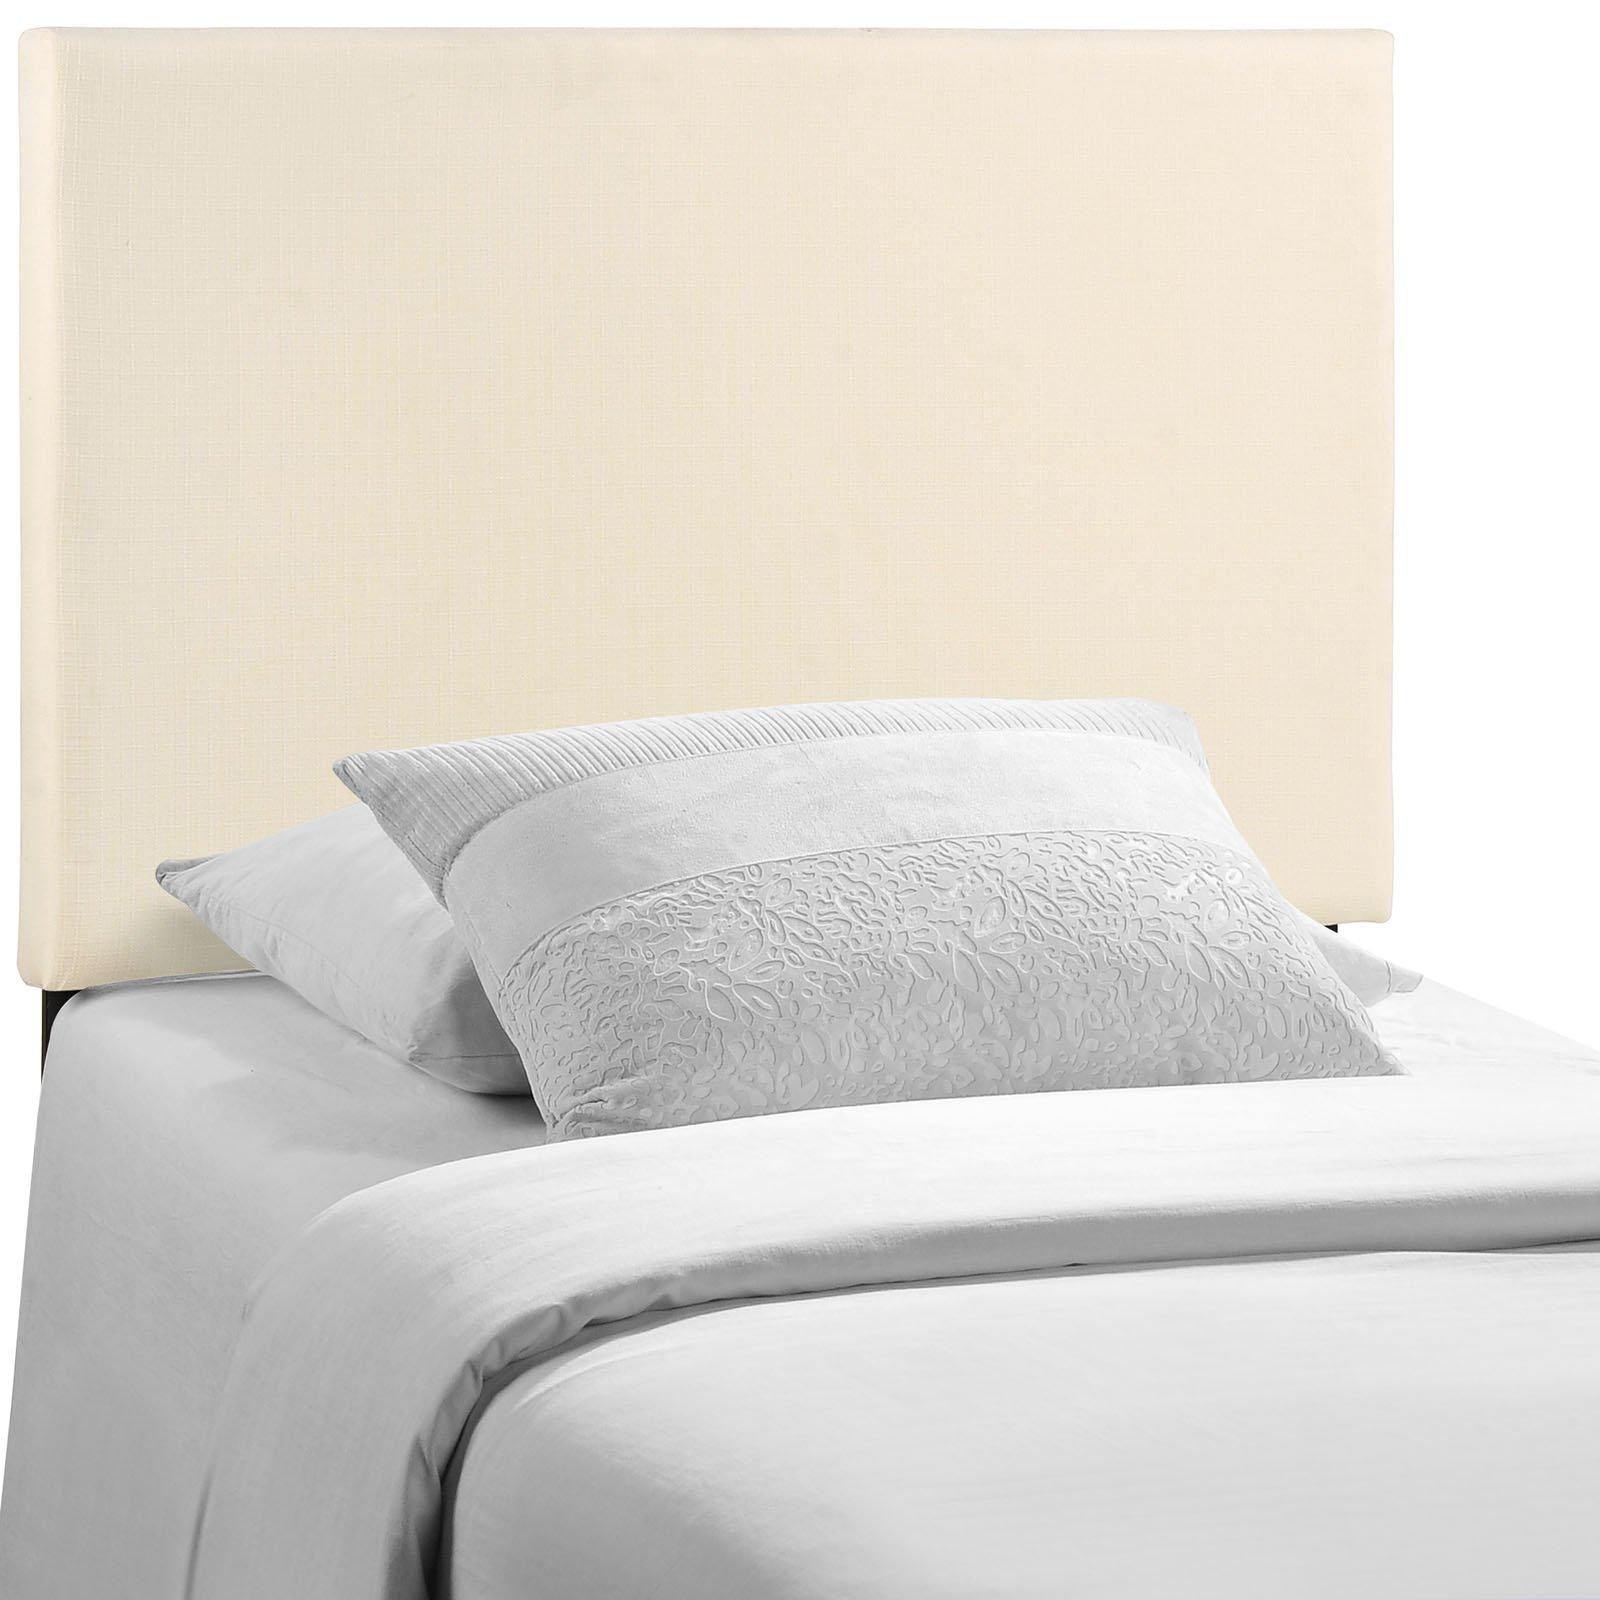 Modway Region Linen Fabric Upholstered Twin Headboard in Ivory